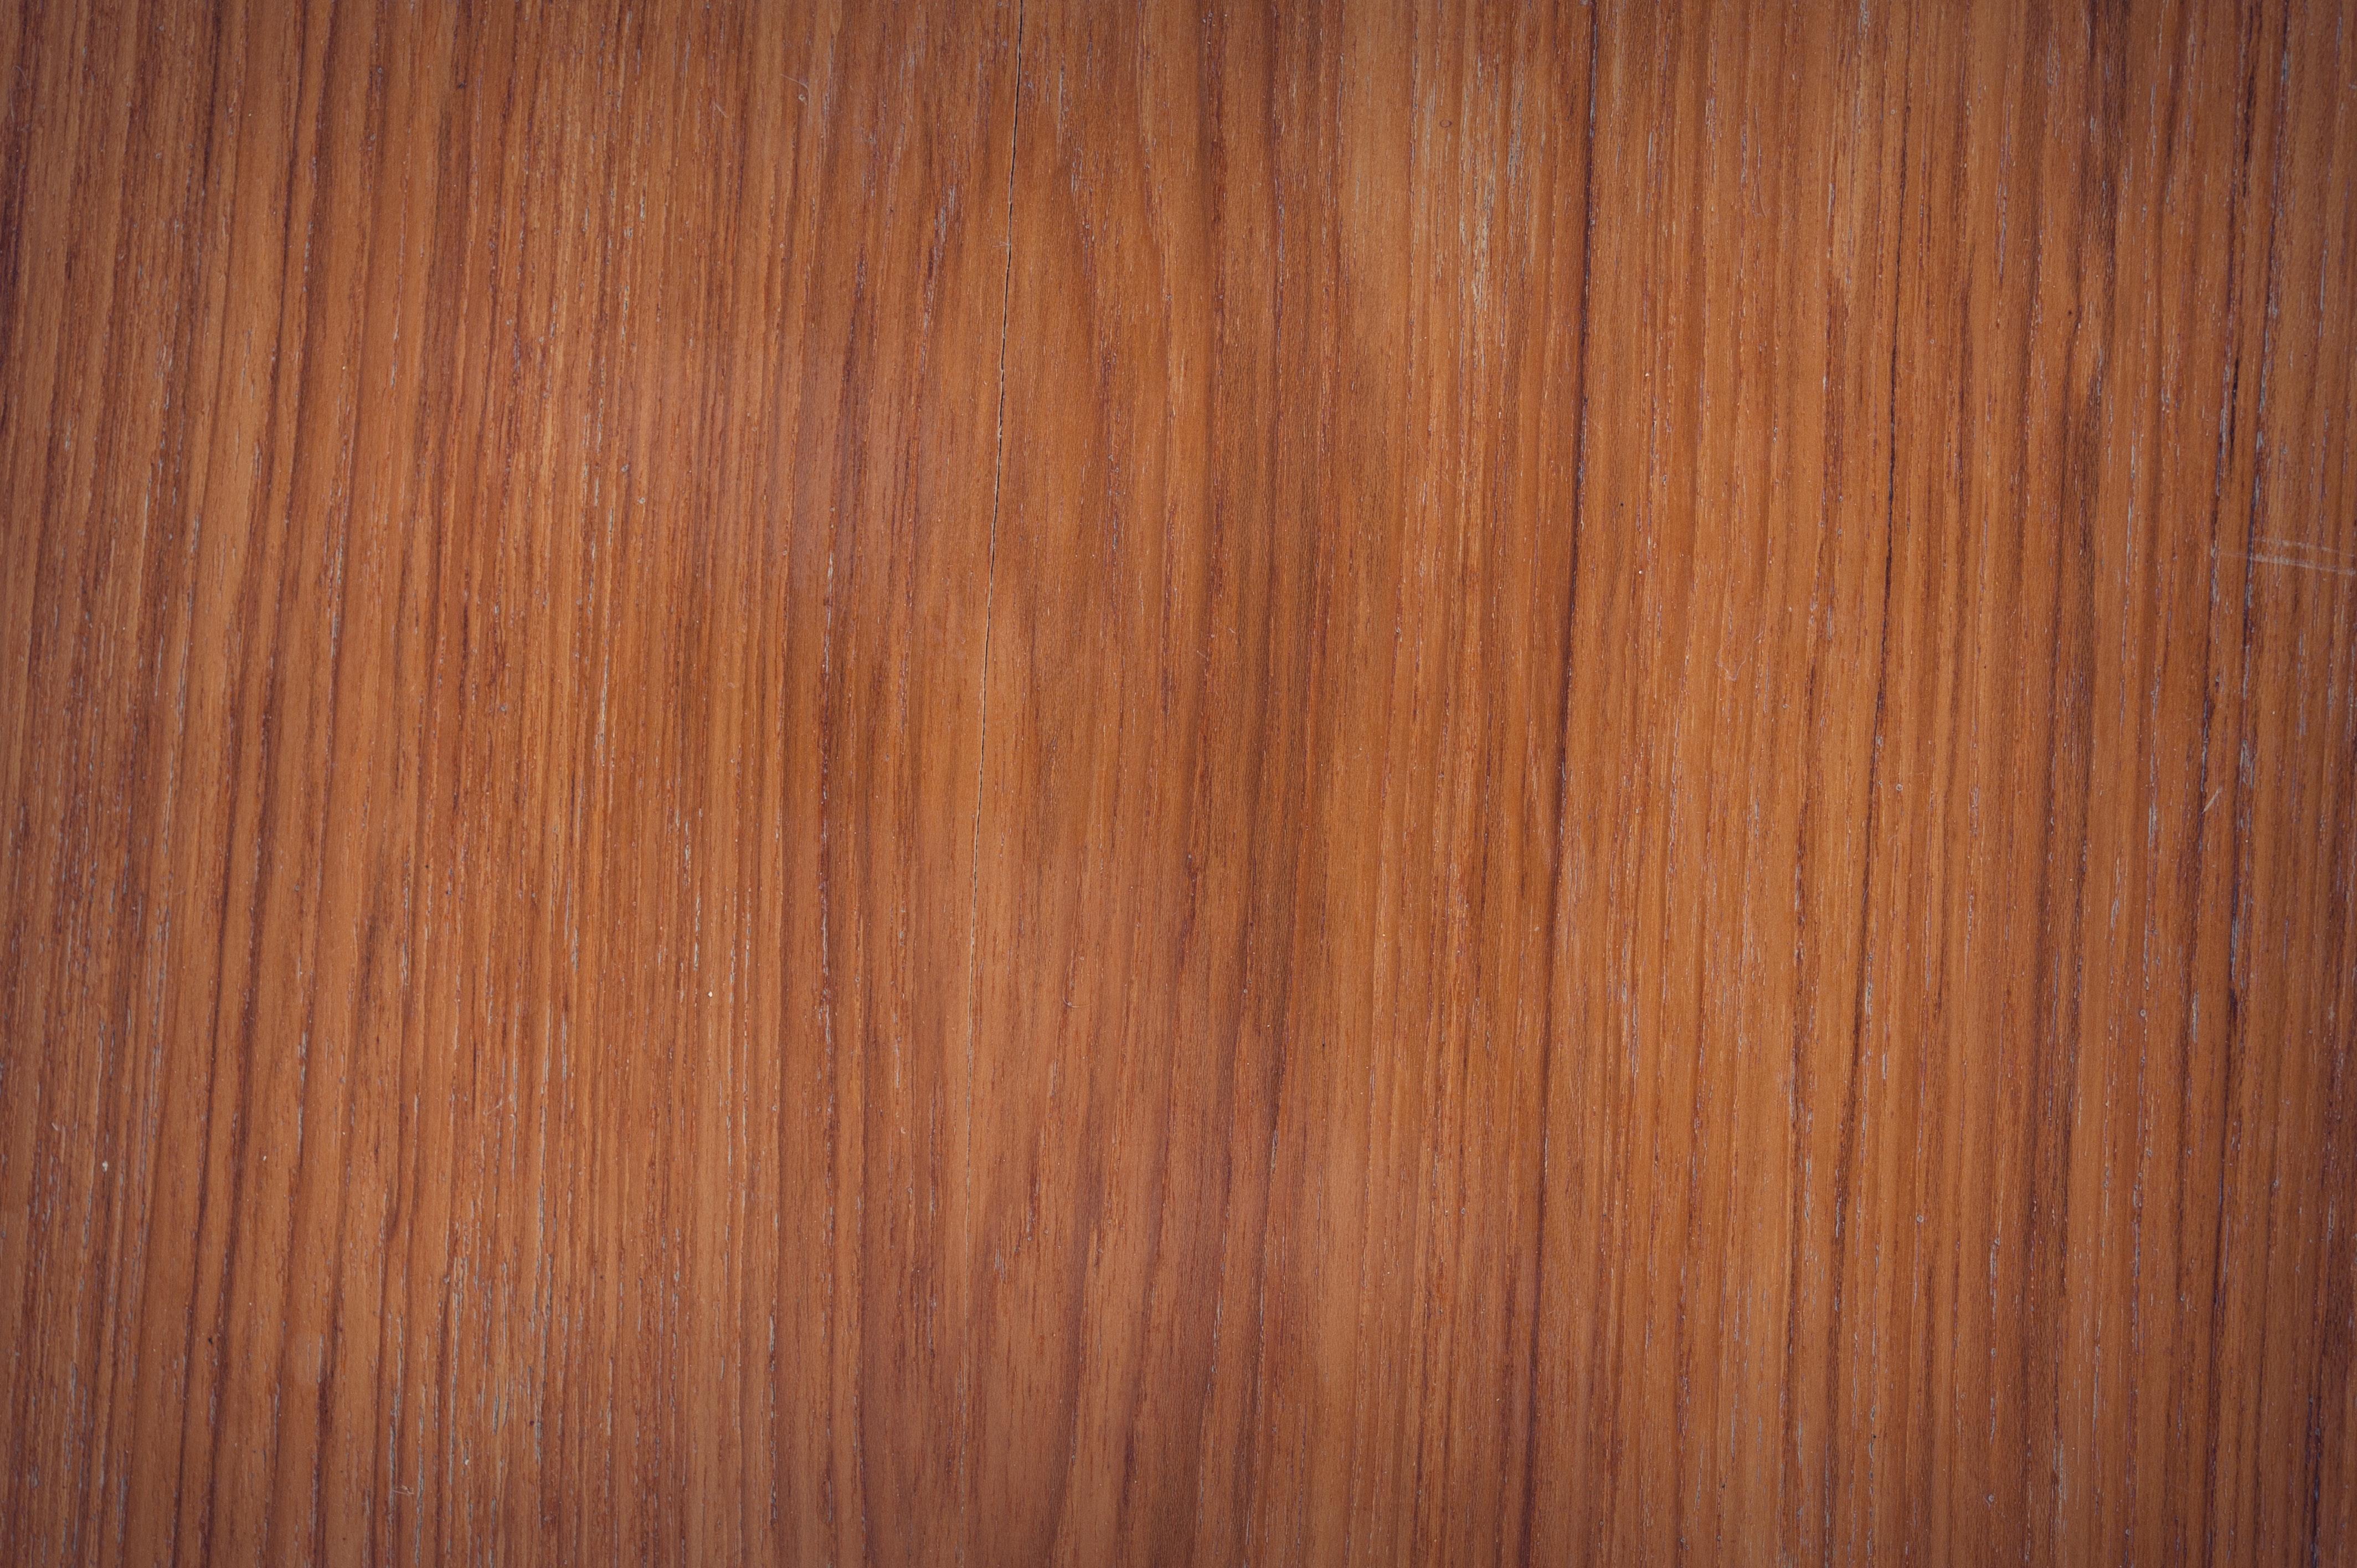 pengelolaan kayu